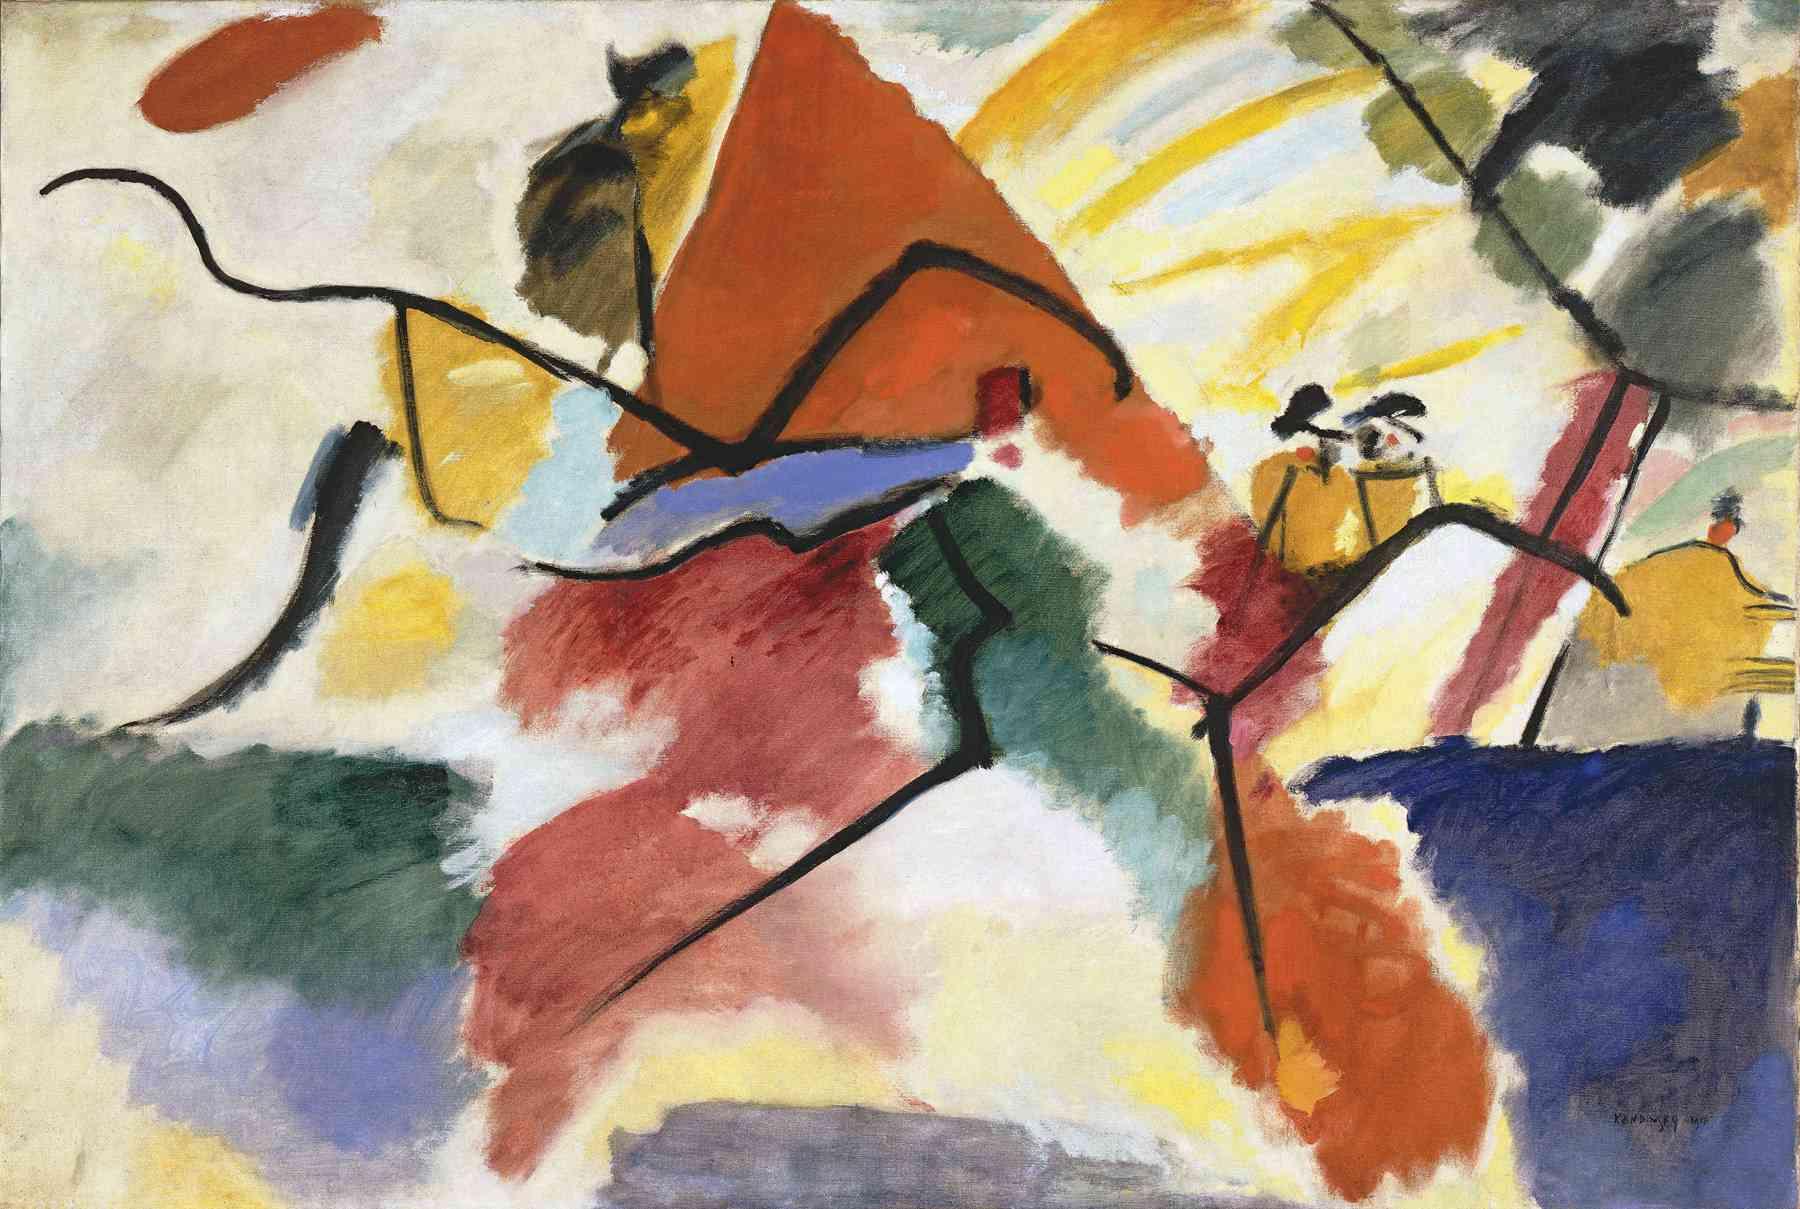 Wassily Kandinsky (Russian, 1866-1944) Wassily Kandinsky (Russian, 1866-1944). Impression V (Park), March 1911. Oil on canvas. 41 11/16 x 62 in. (106 x 157.5 cm). Gift of Nina Kandinsky, 1976. Musée national d'art moderne, Centre Pompidou, Paris.